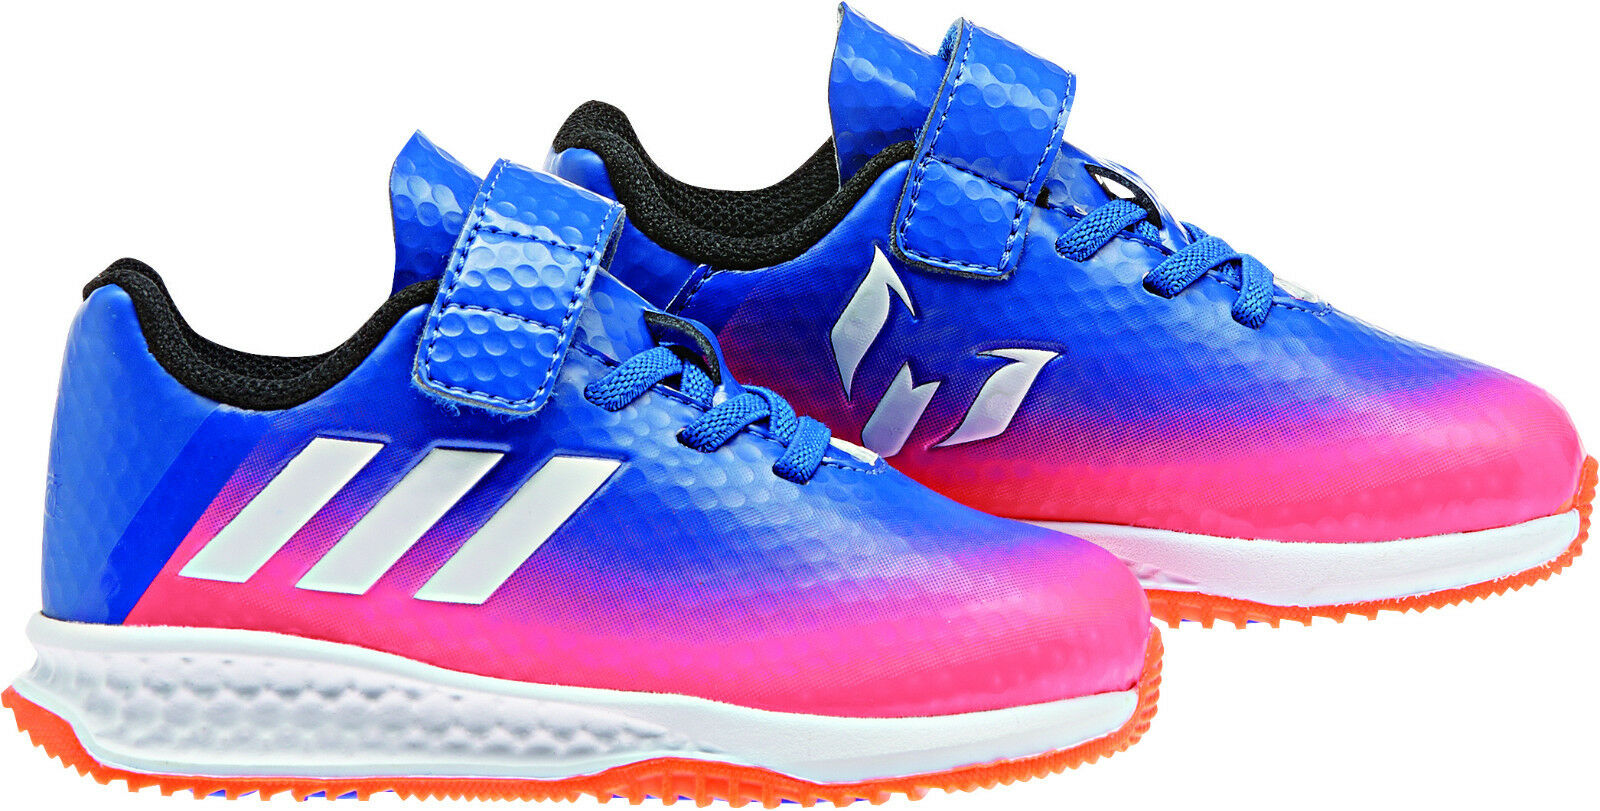 Adidas Messi Kinderschuhe, Rapida Turf, Fußball Babyschuhe Kinder Schuhe, BB0235